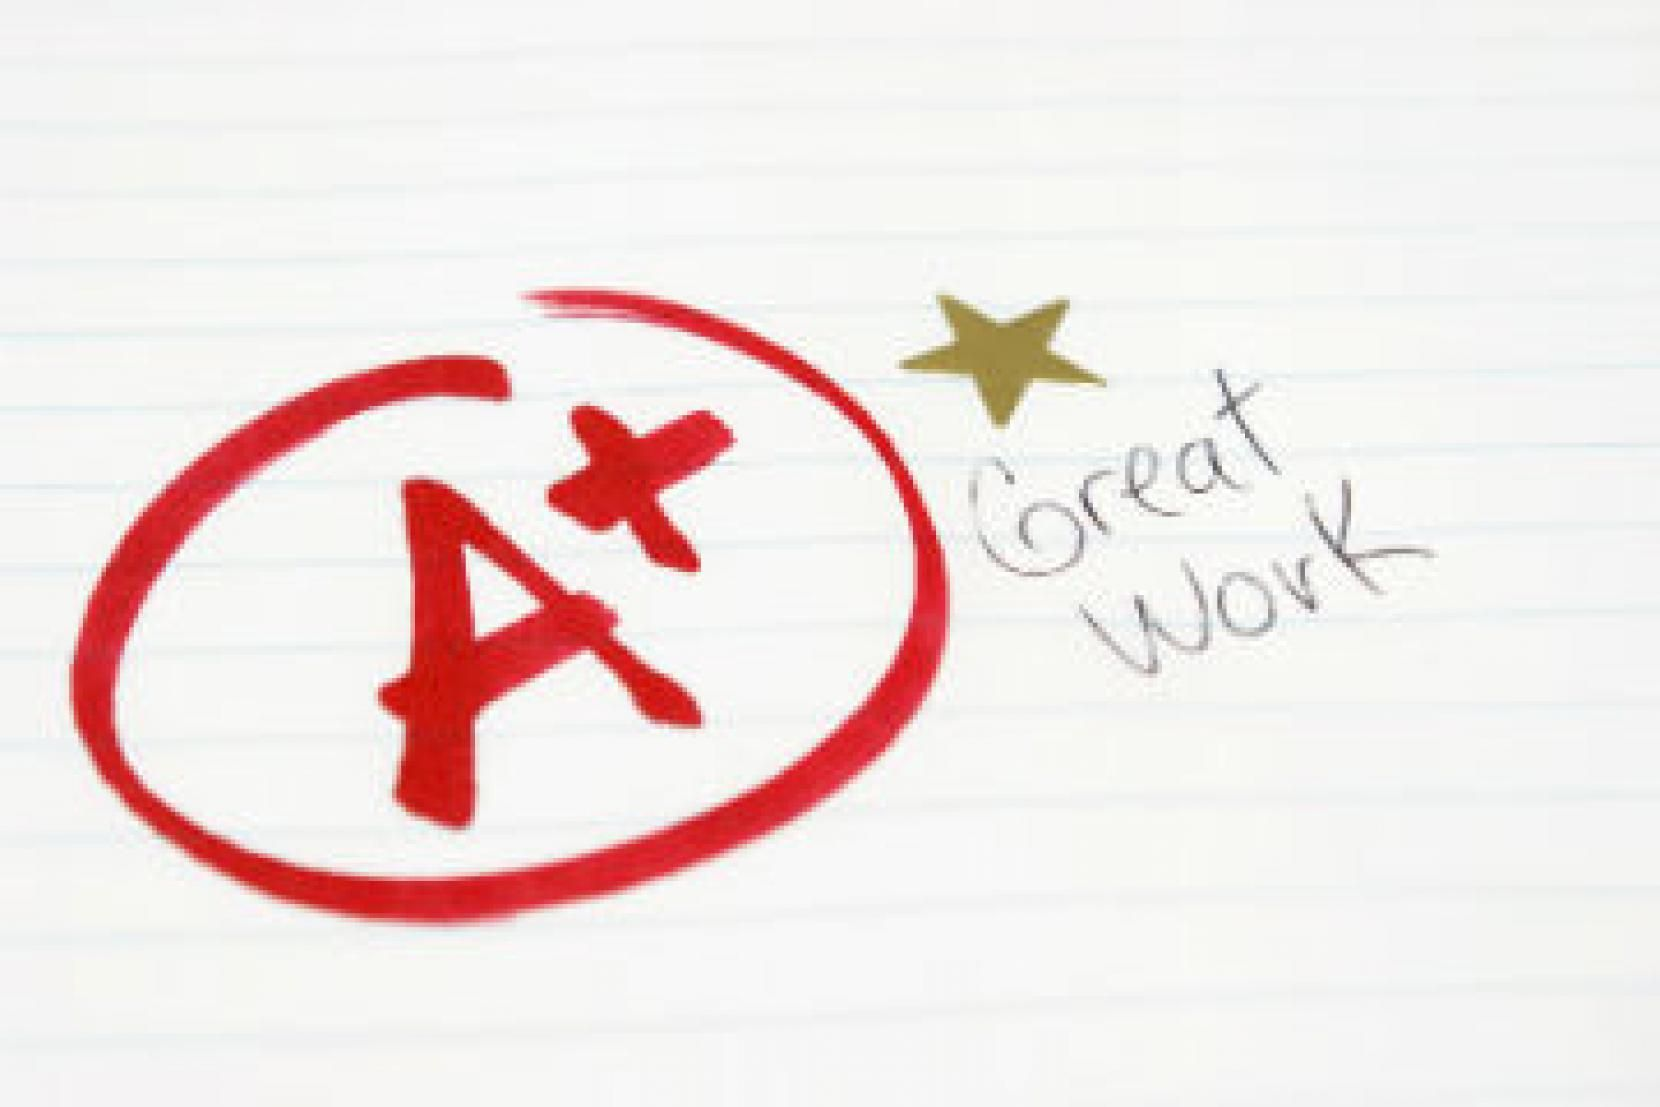 School Homework Need To Be More Motivating Ut New Good Grade High Math Writing Paid Essay